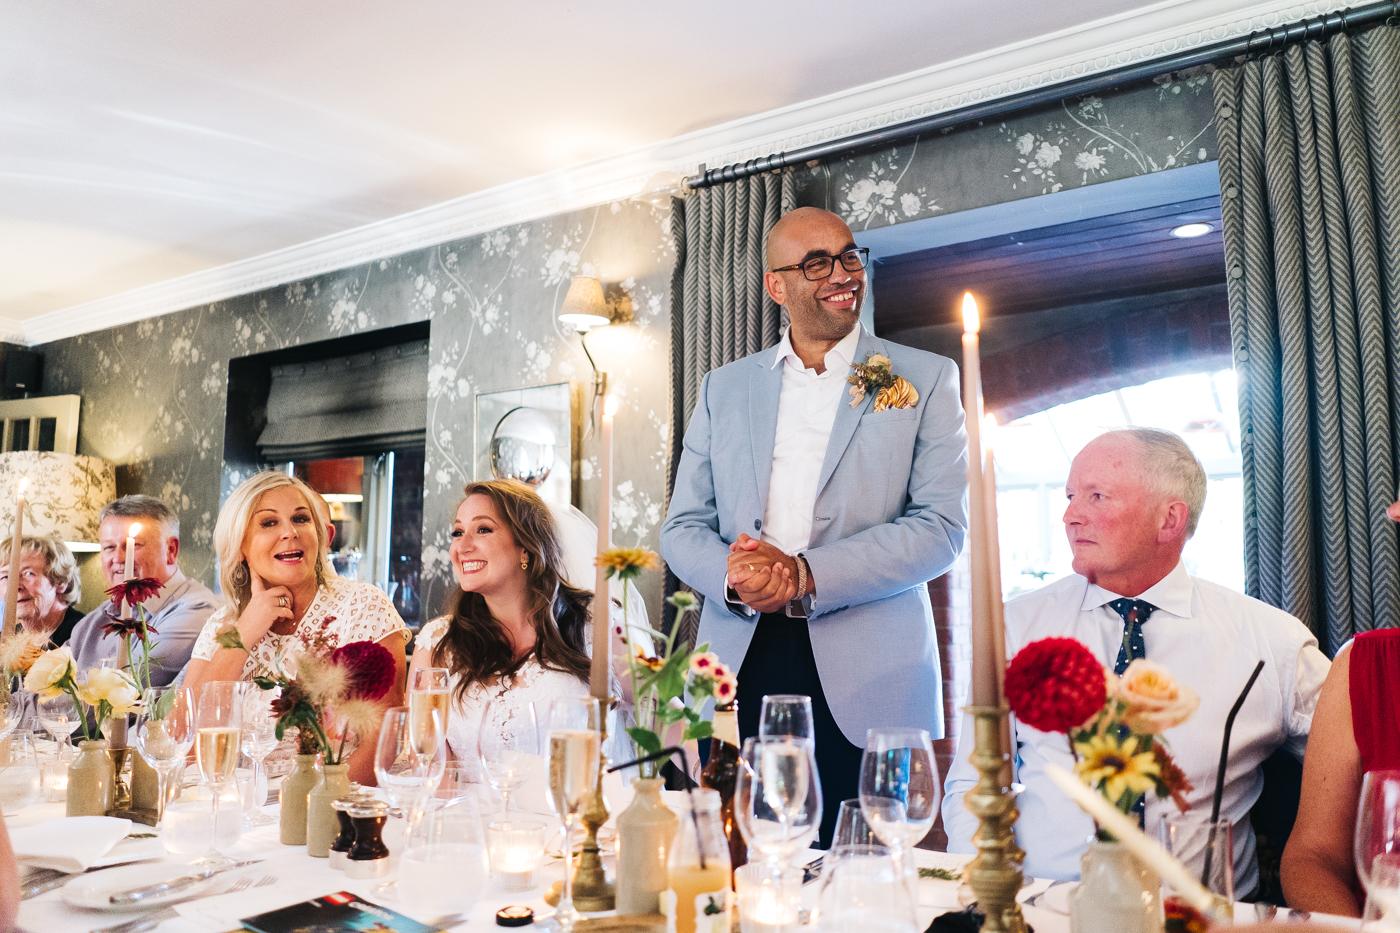 wedding-at-the-pheasant-harome-helmsley-north-yorkshire-wedding-photographer-0041.jpg